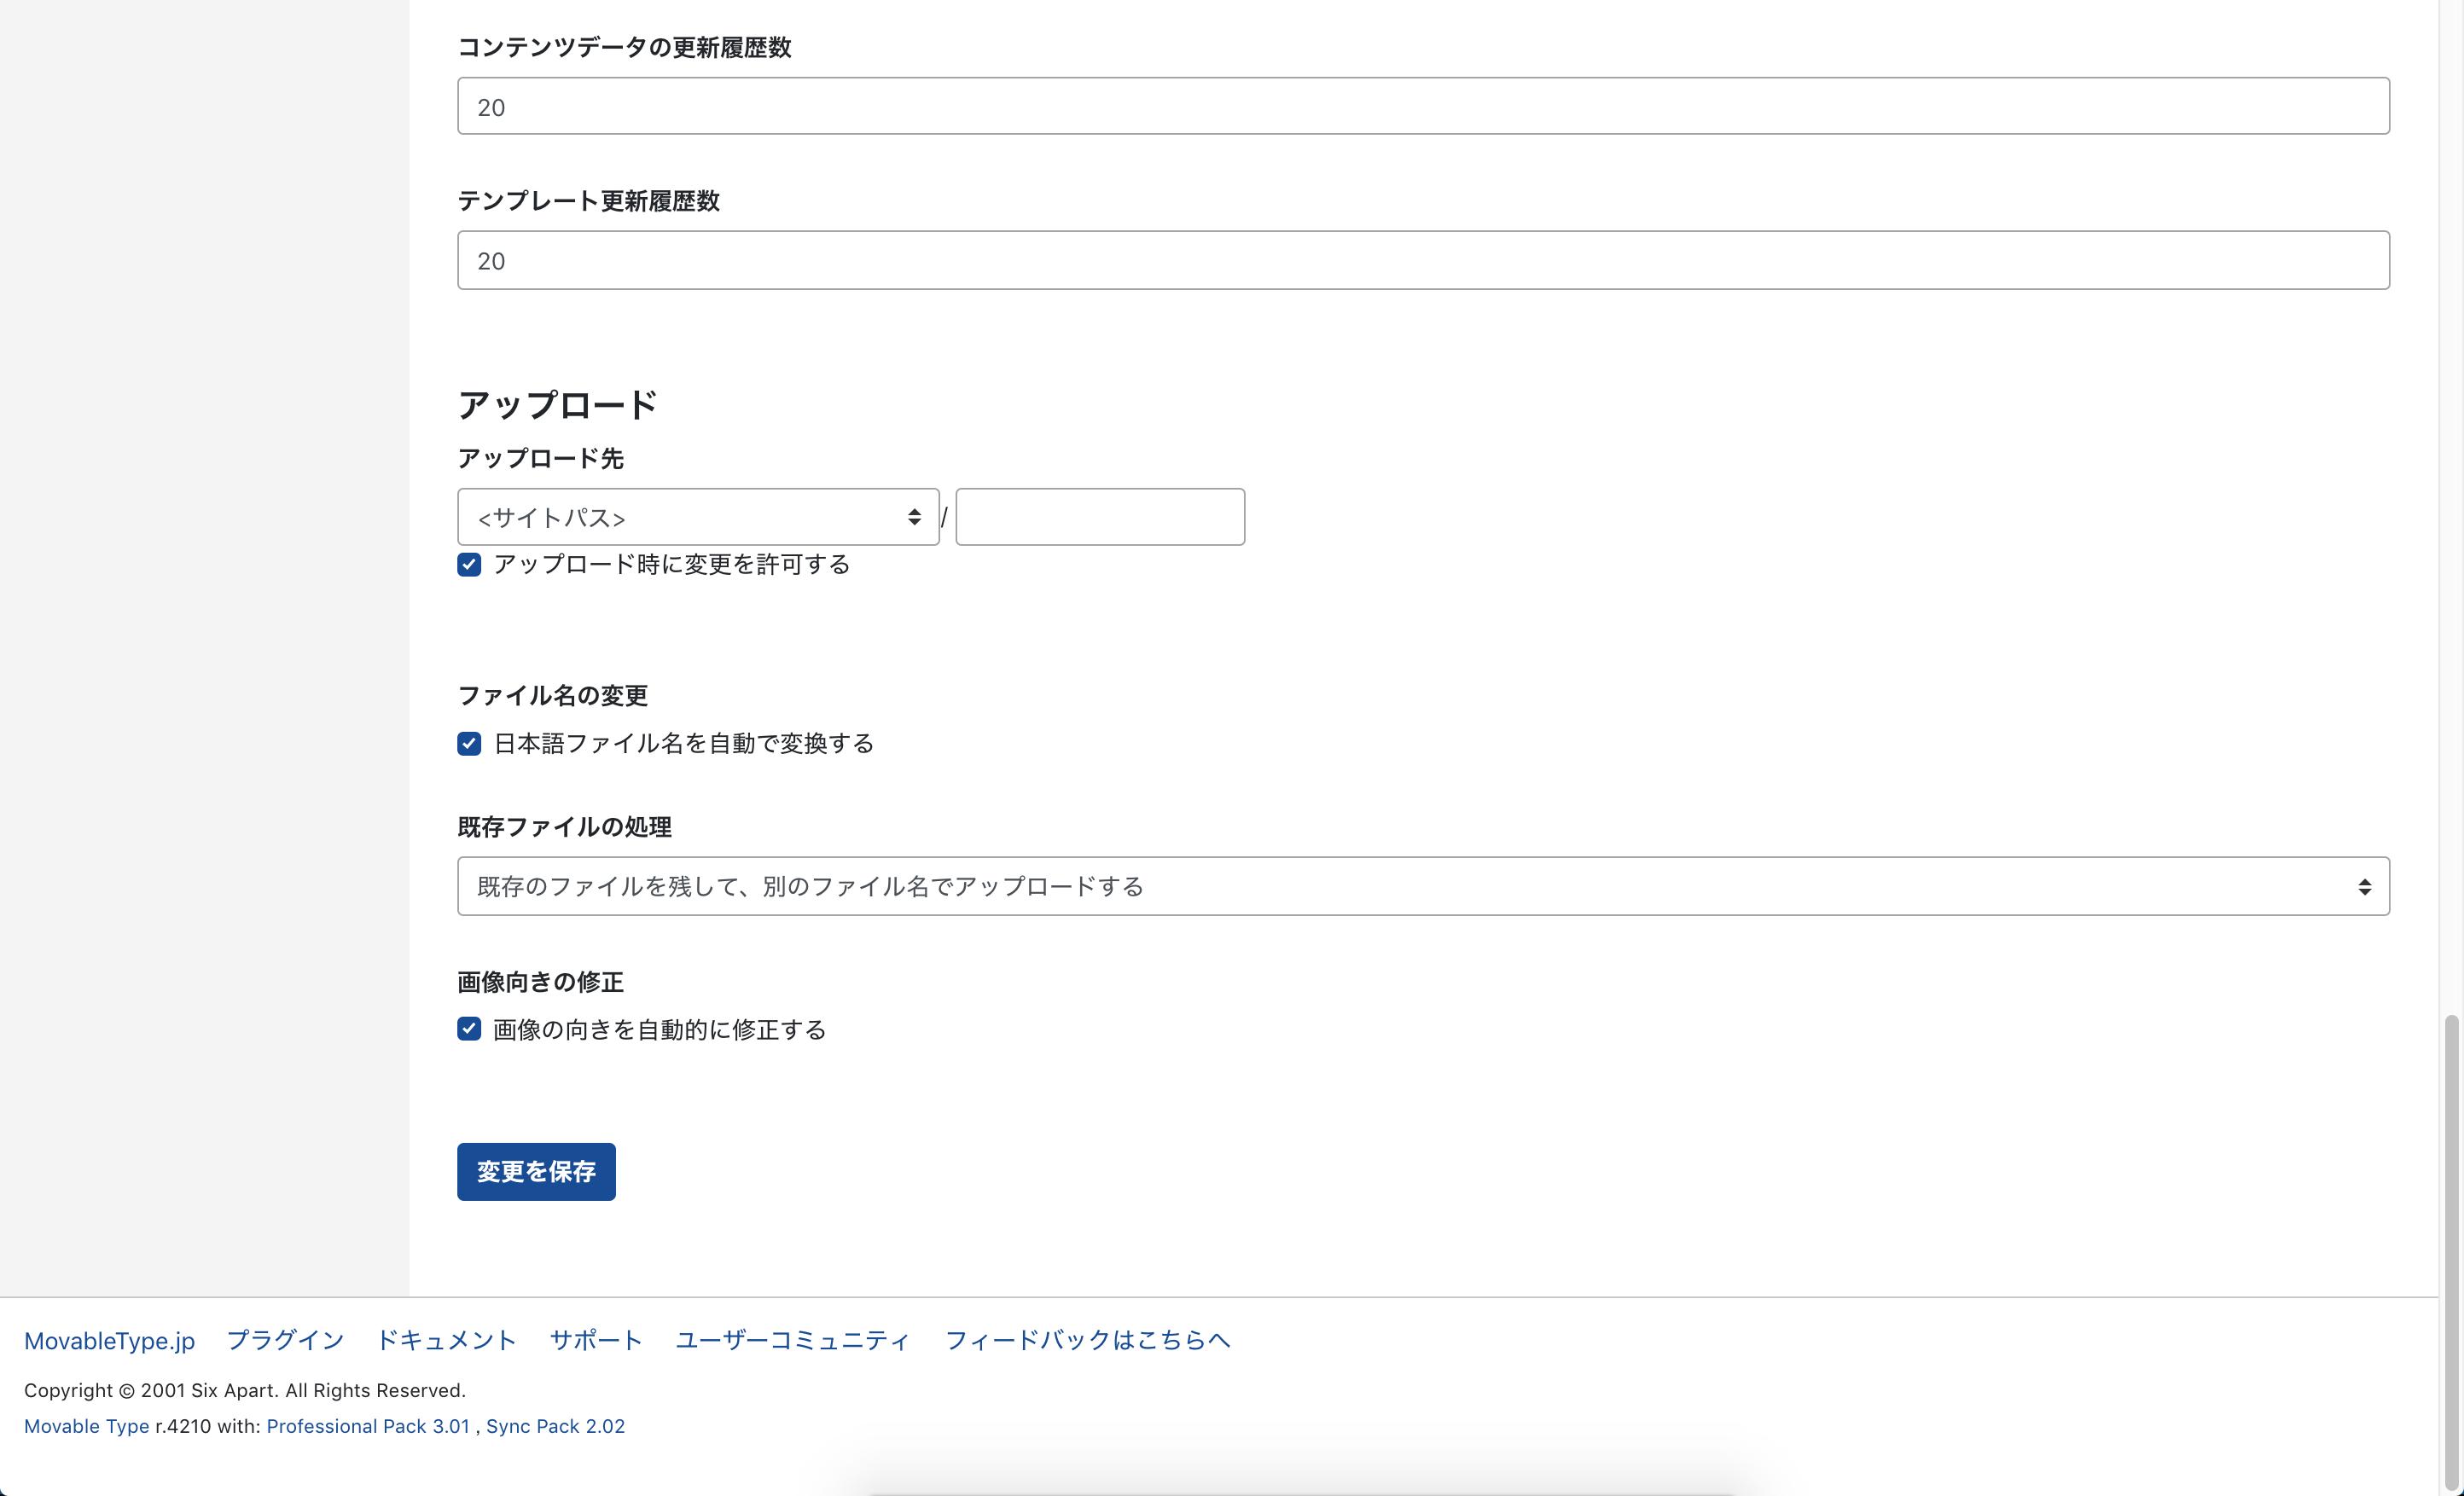 site-prefs-upload.png